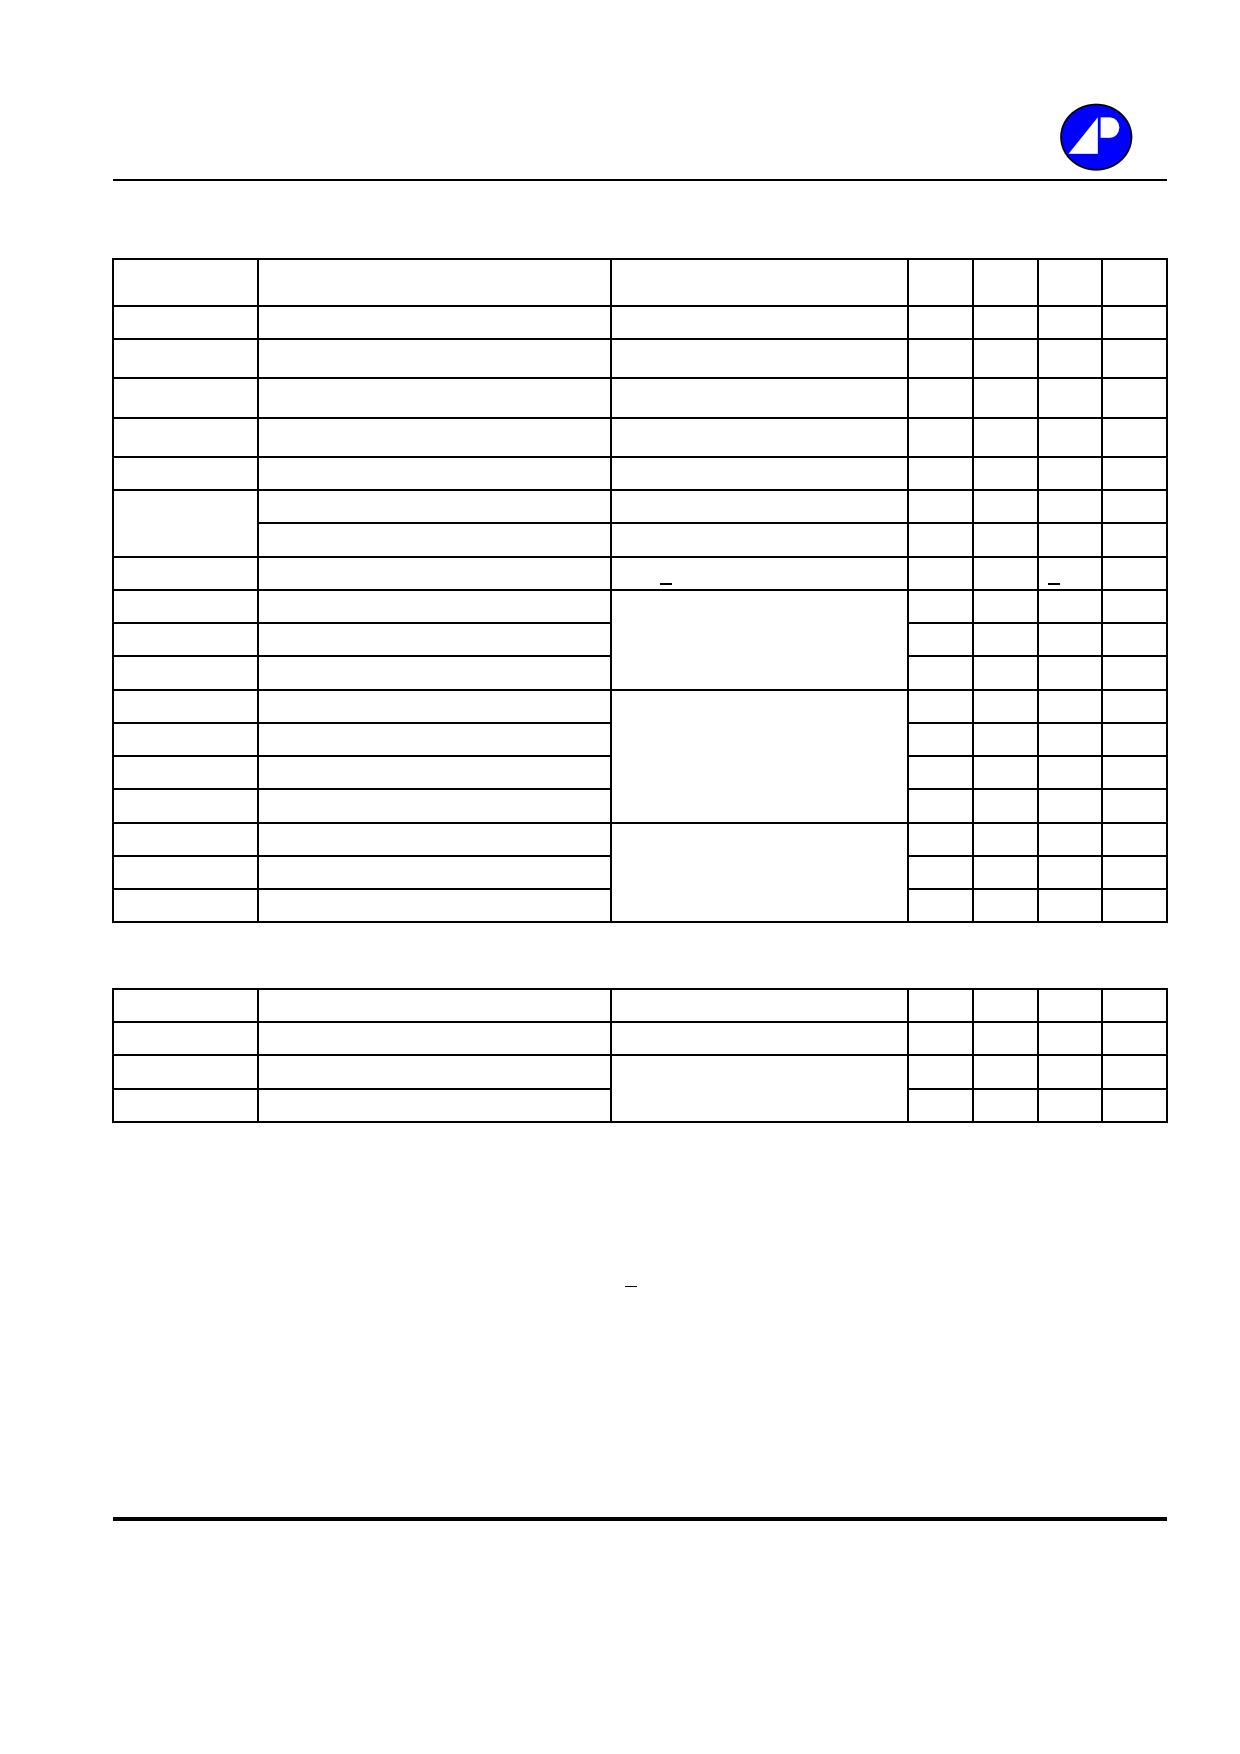 AP4435GM-HF pdf, schematic